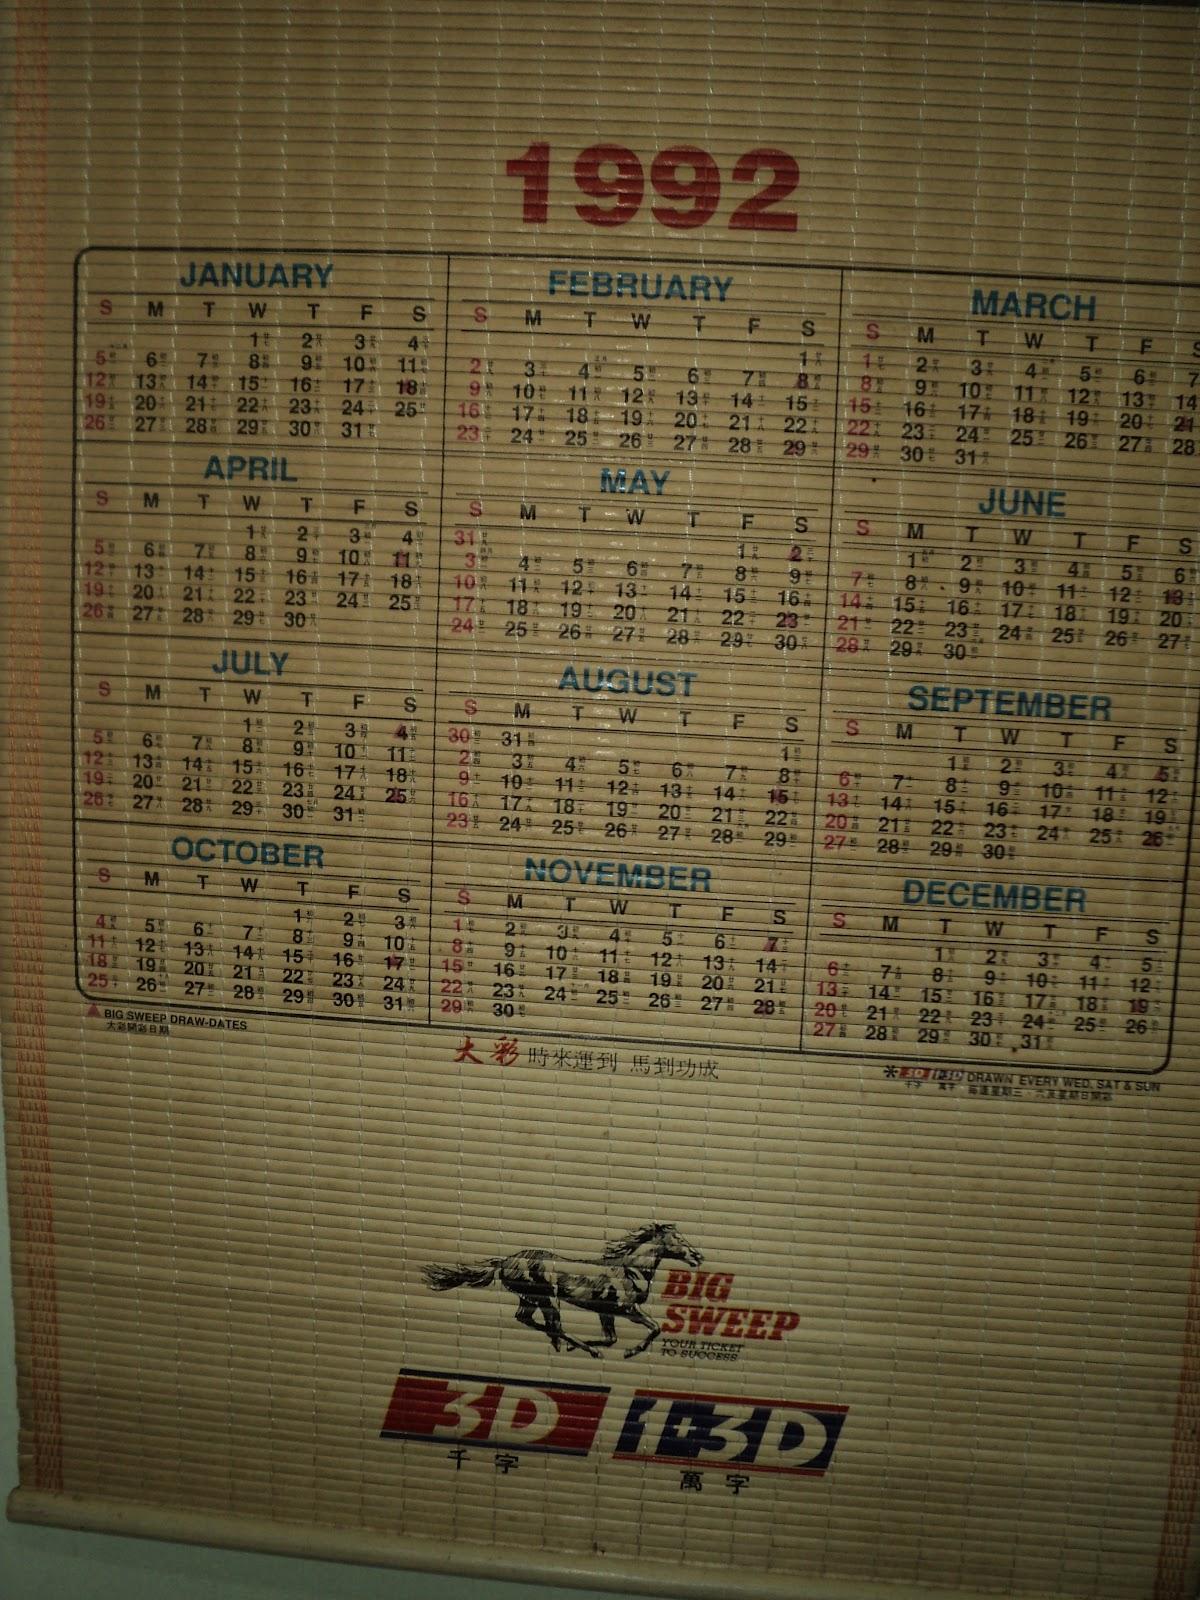 April 1995 Kalender | New Calendar Template Site